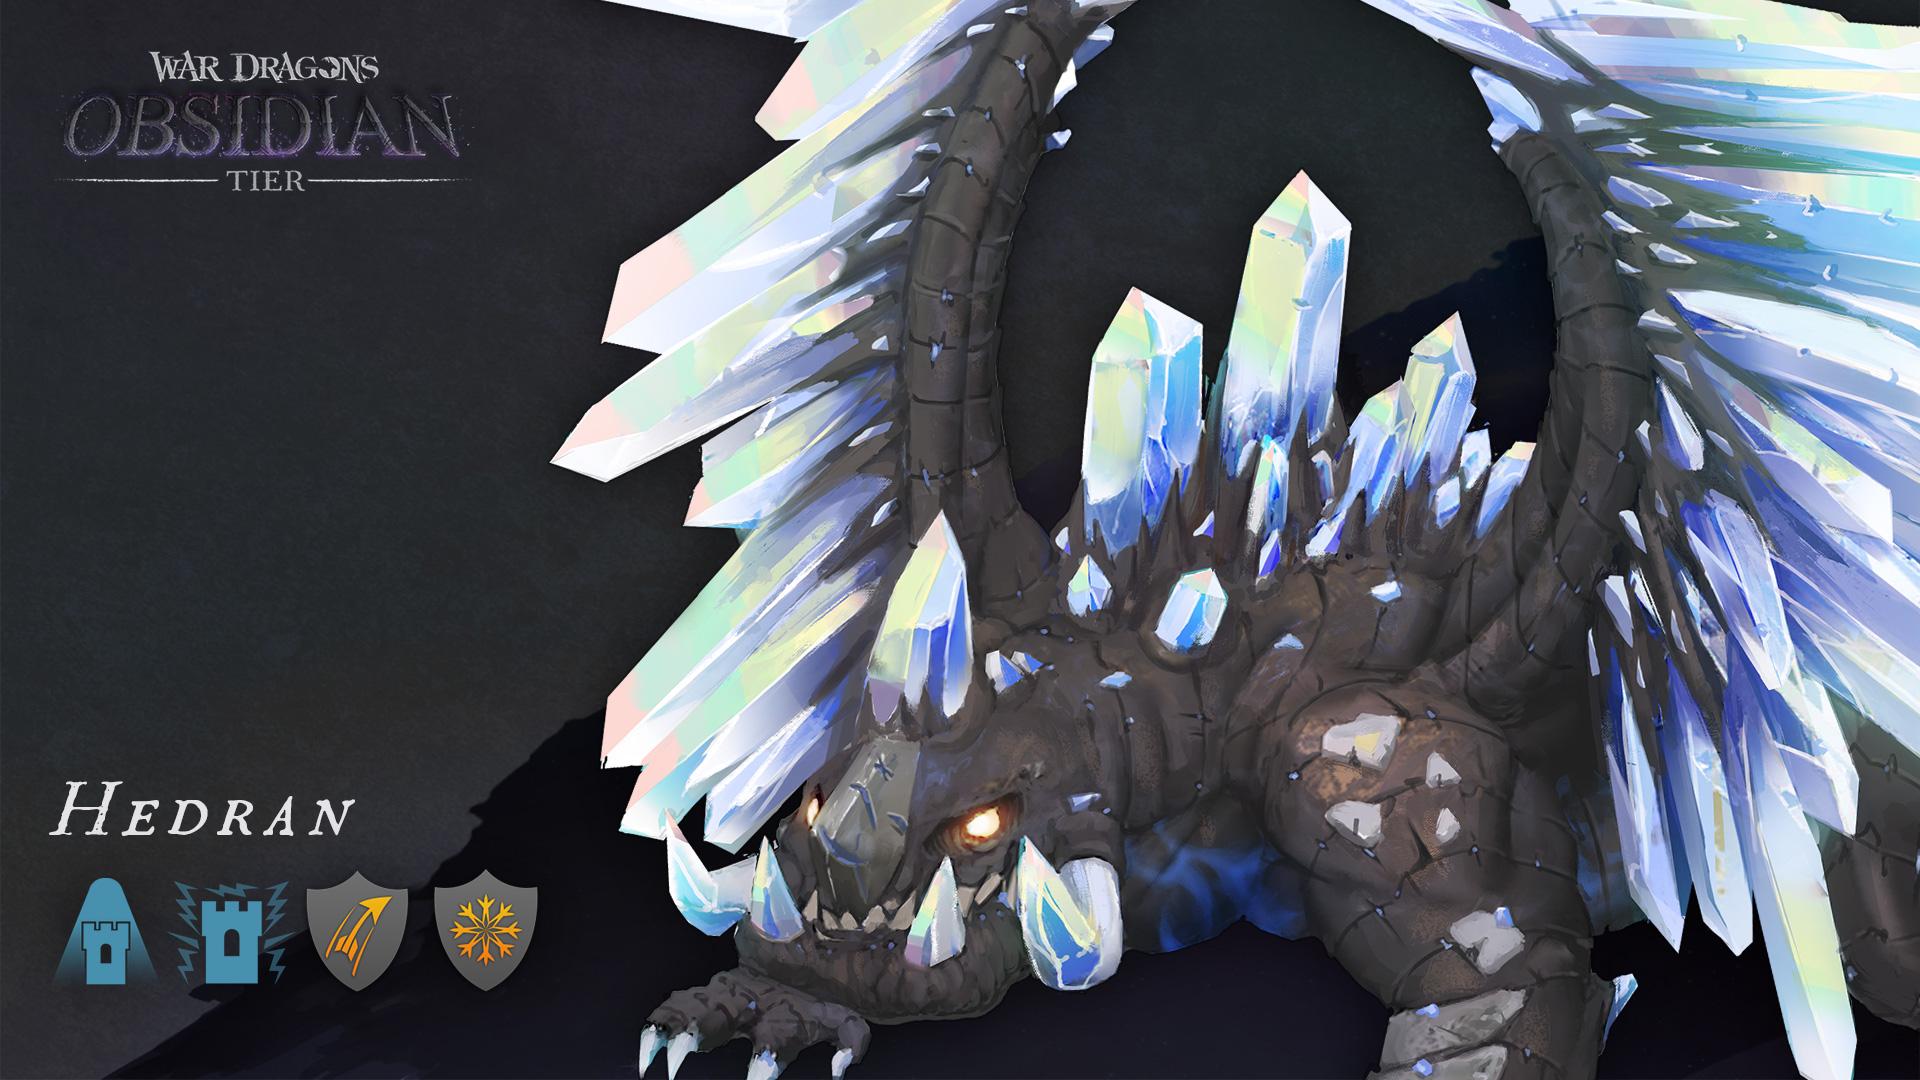 War Dragons - Hedran